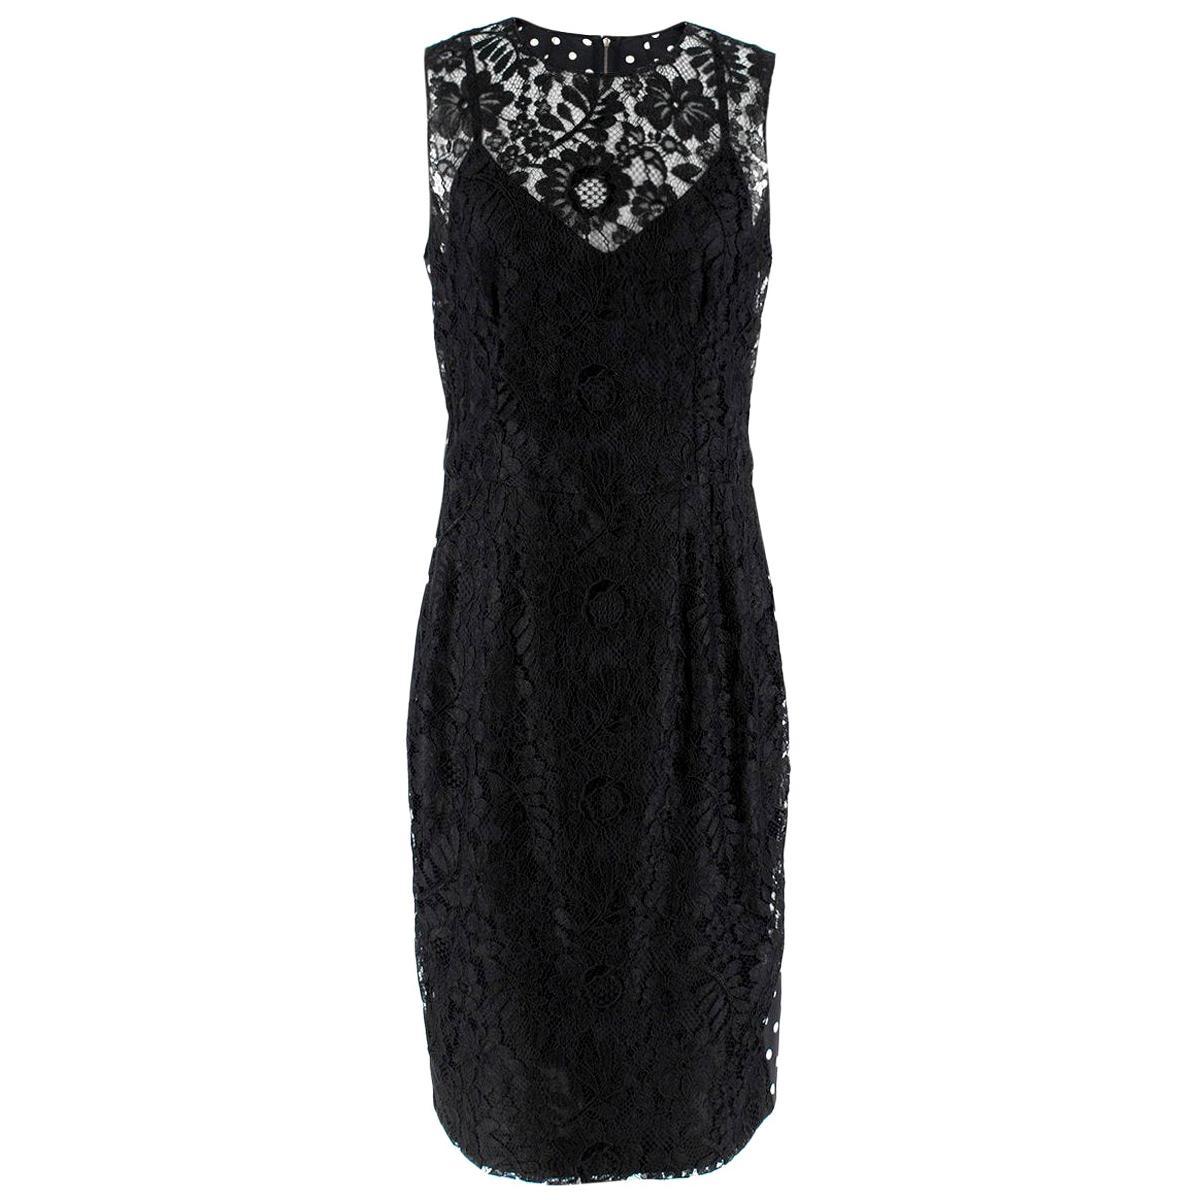 Dolce & Gabbana lace-panel polka-dot print dress US 10